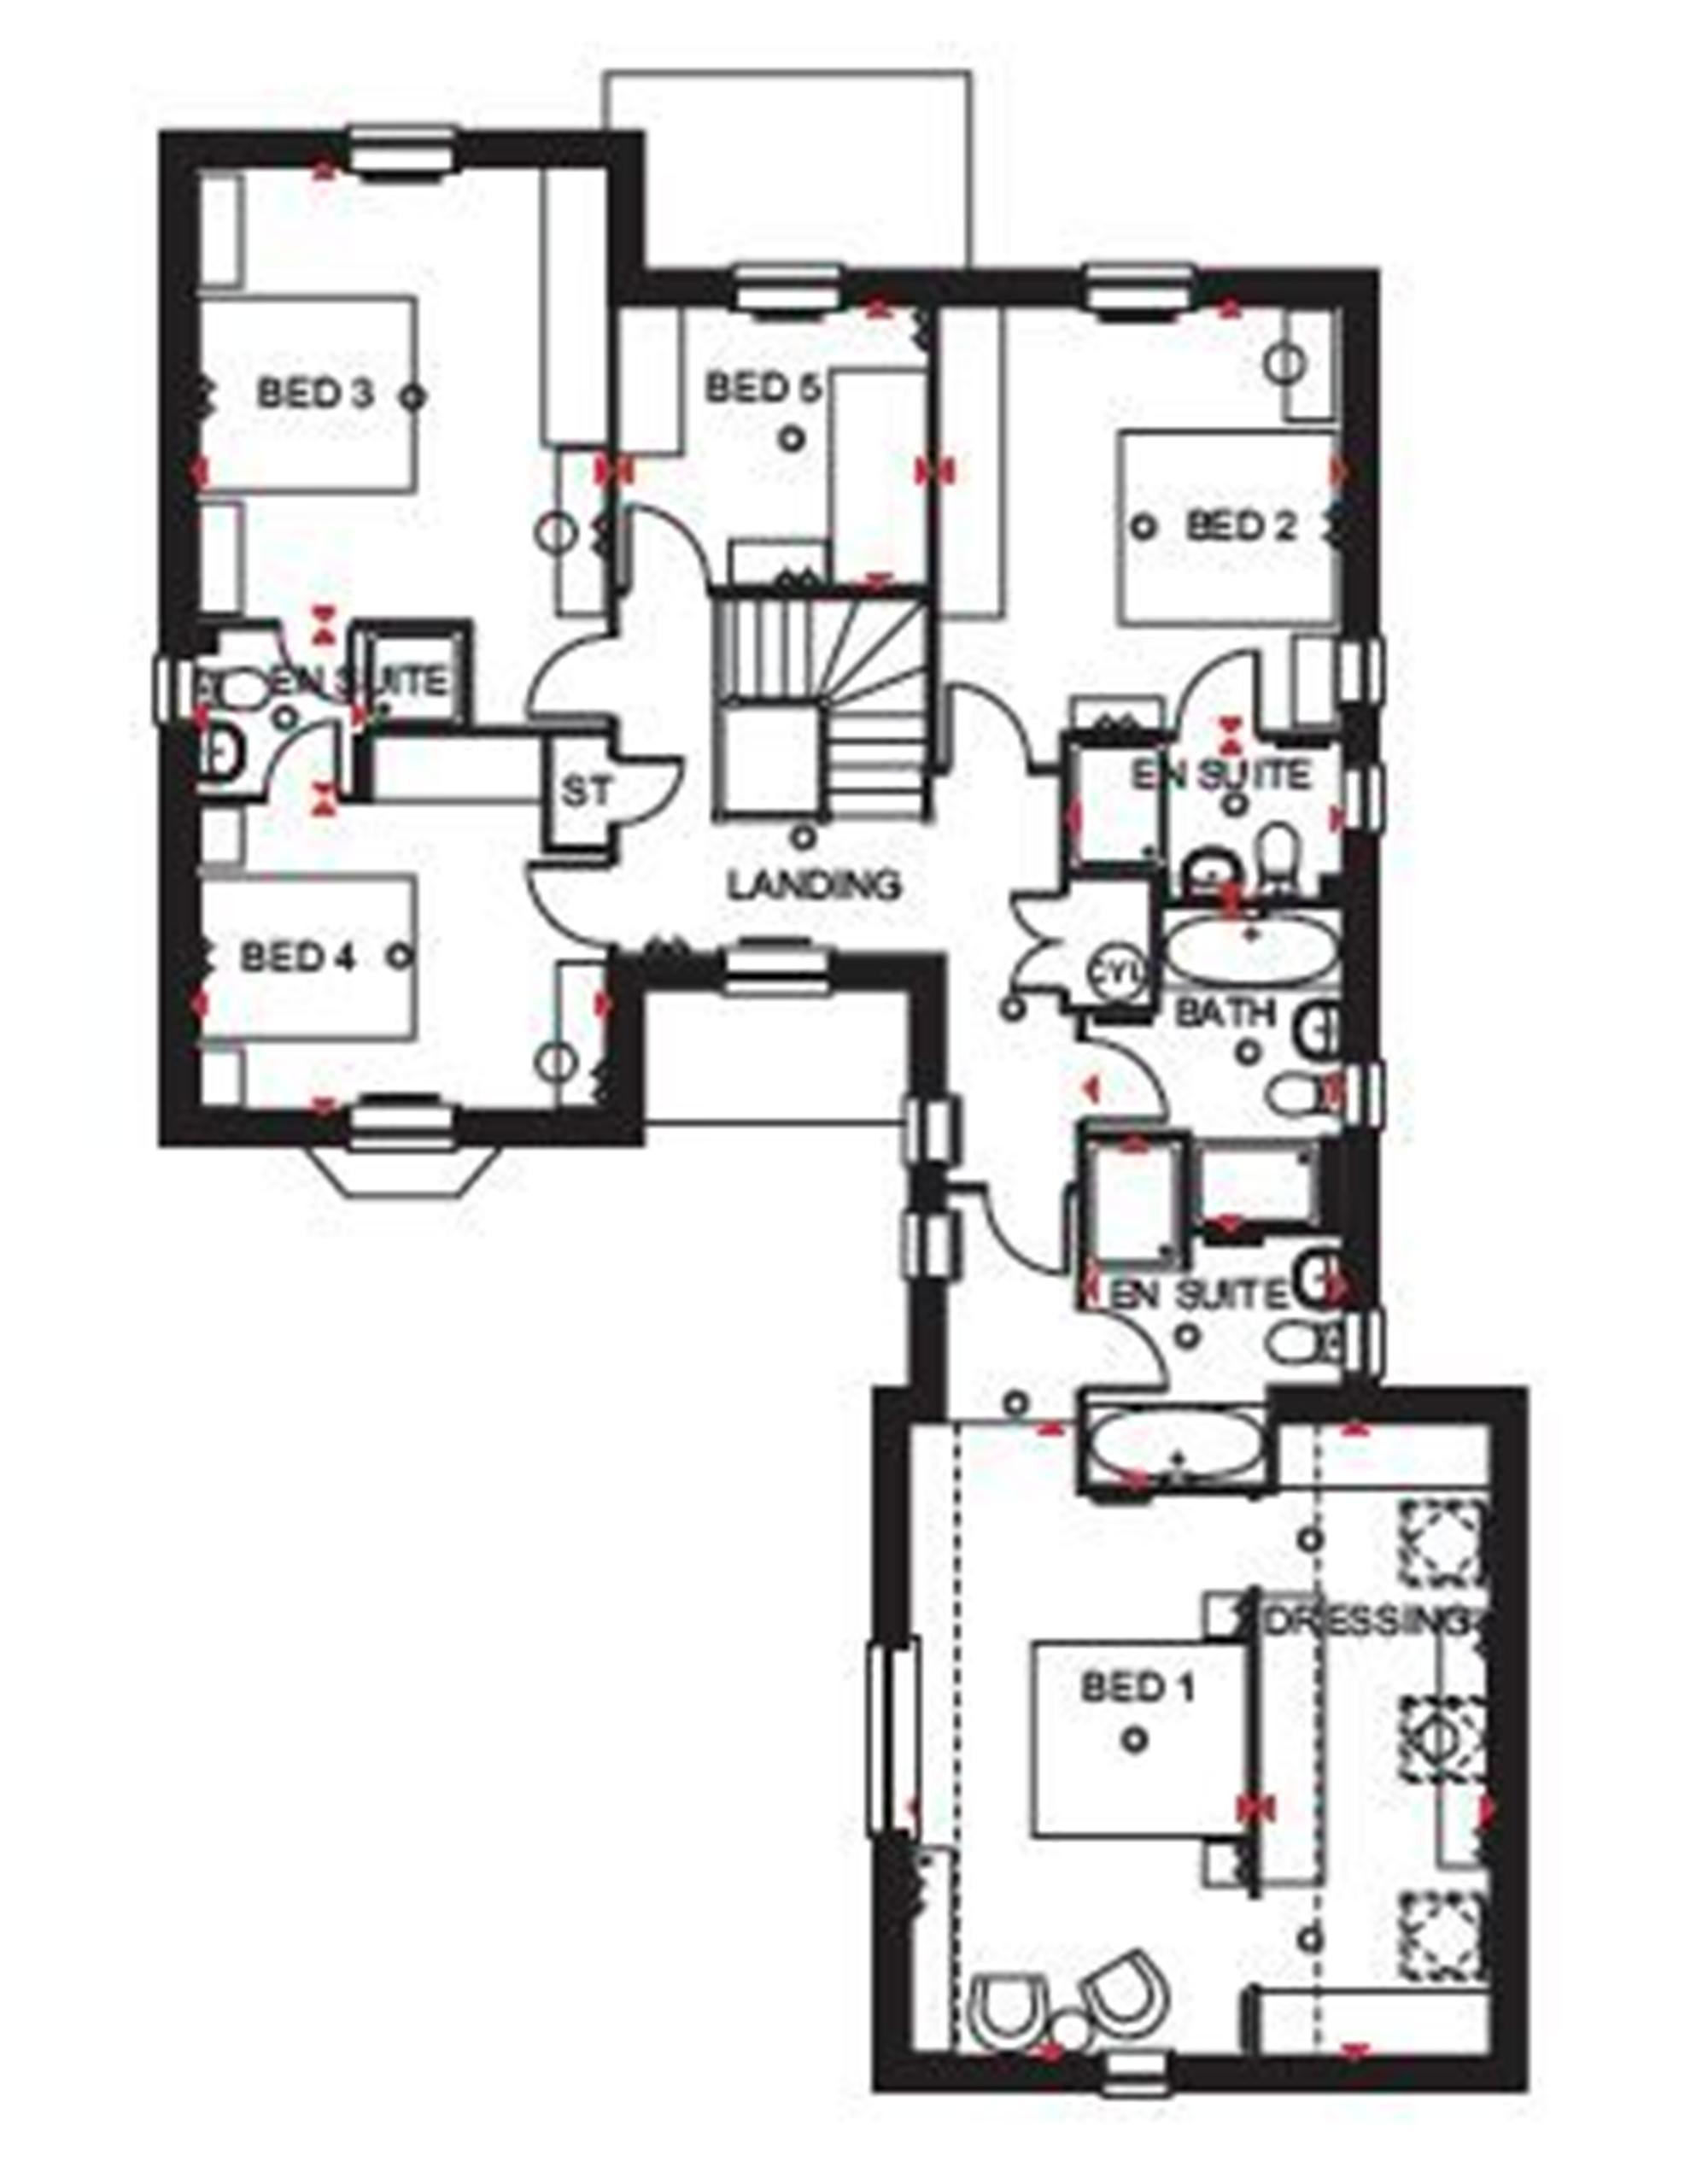 david wilson homes moorcroft floor plan david wilson homes moorcroft floor plan